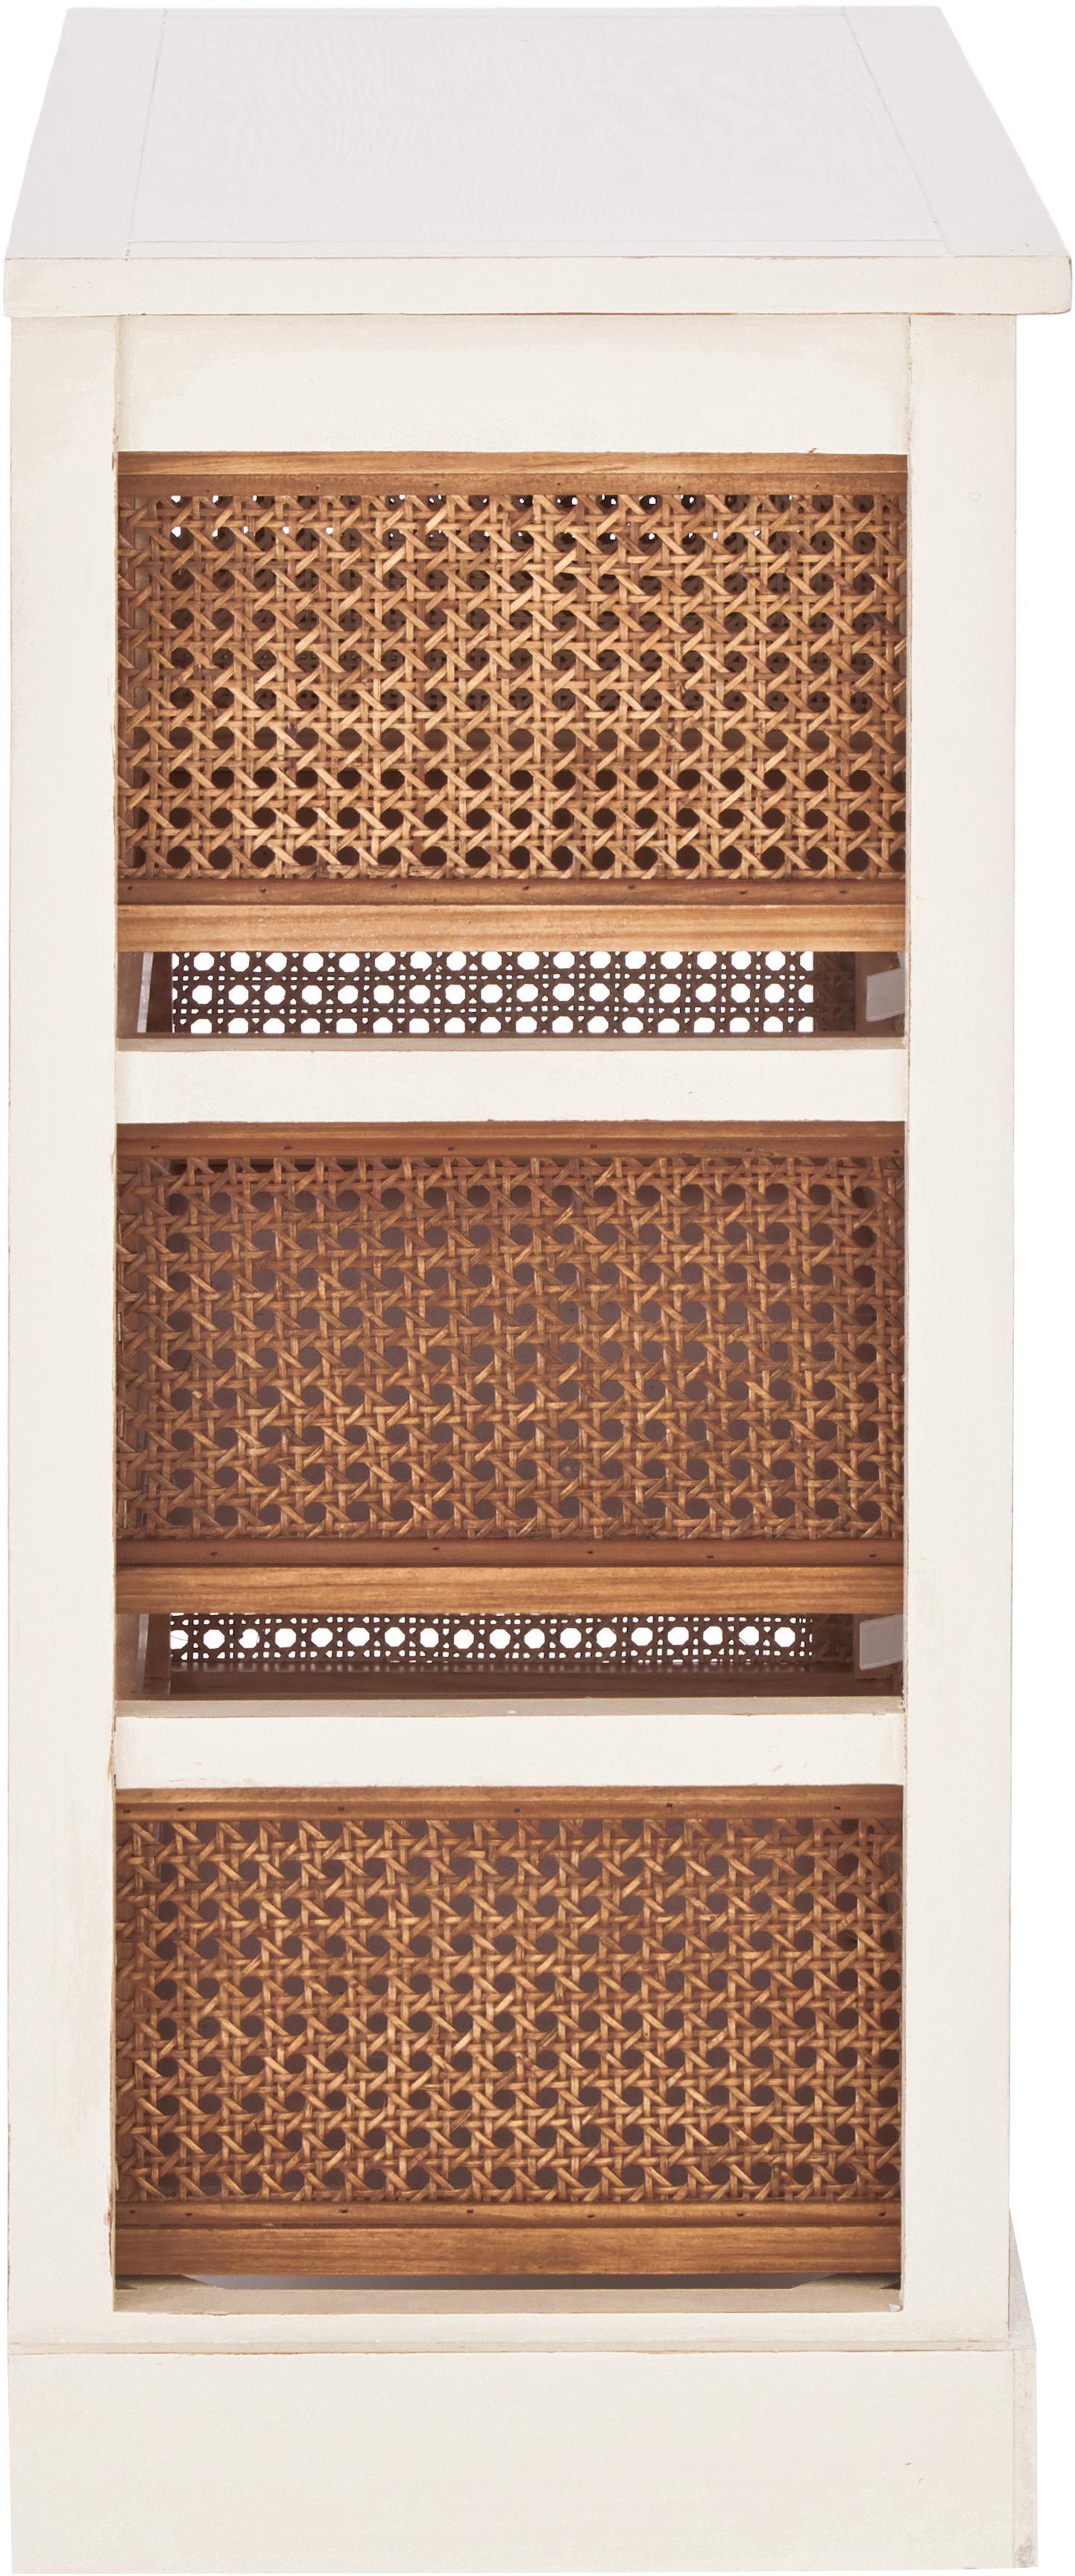 Rattan-Kommode Bantu mit Schubladen, Korpus: Kiefernholz, cremeweiss l, Cremeweiss, Braun, 74 x 77 cm